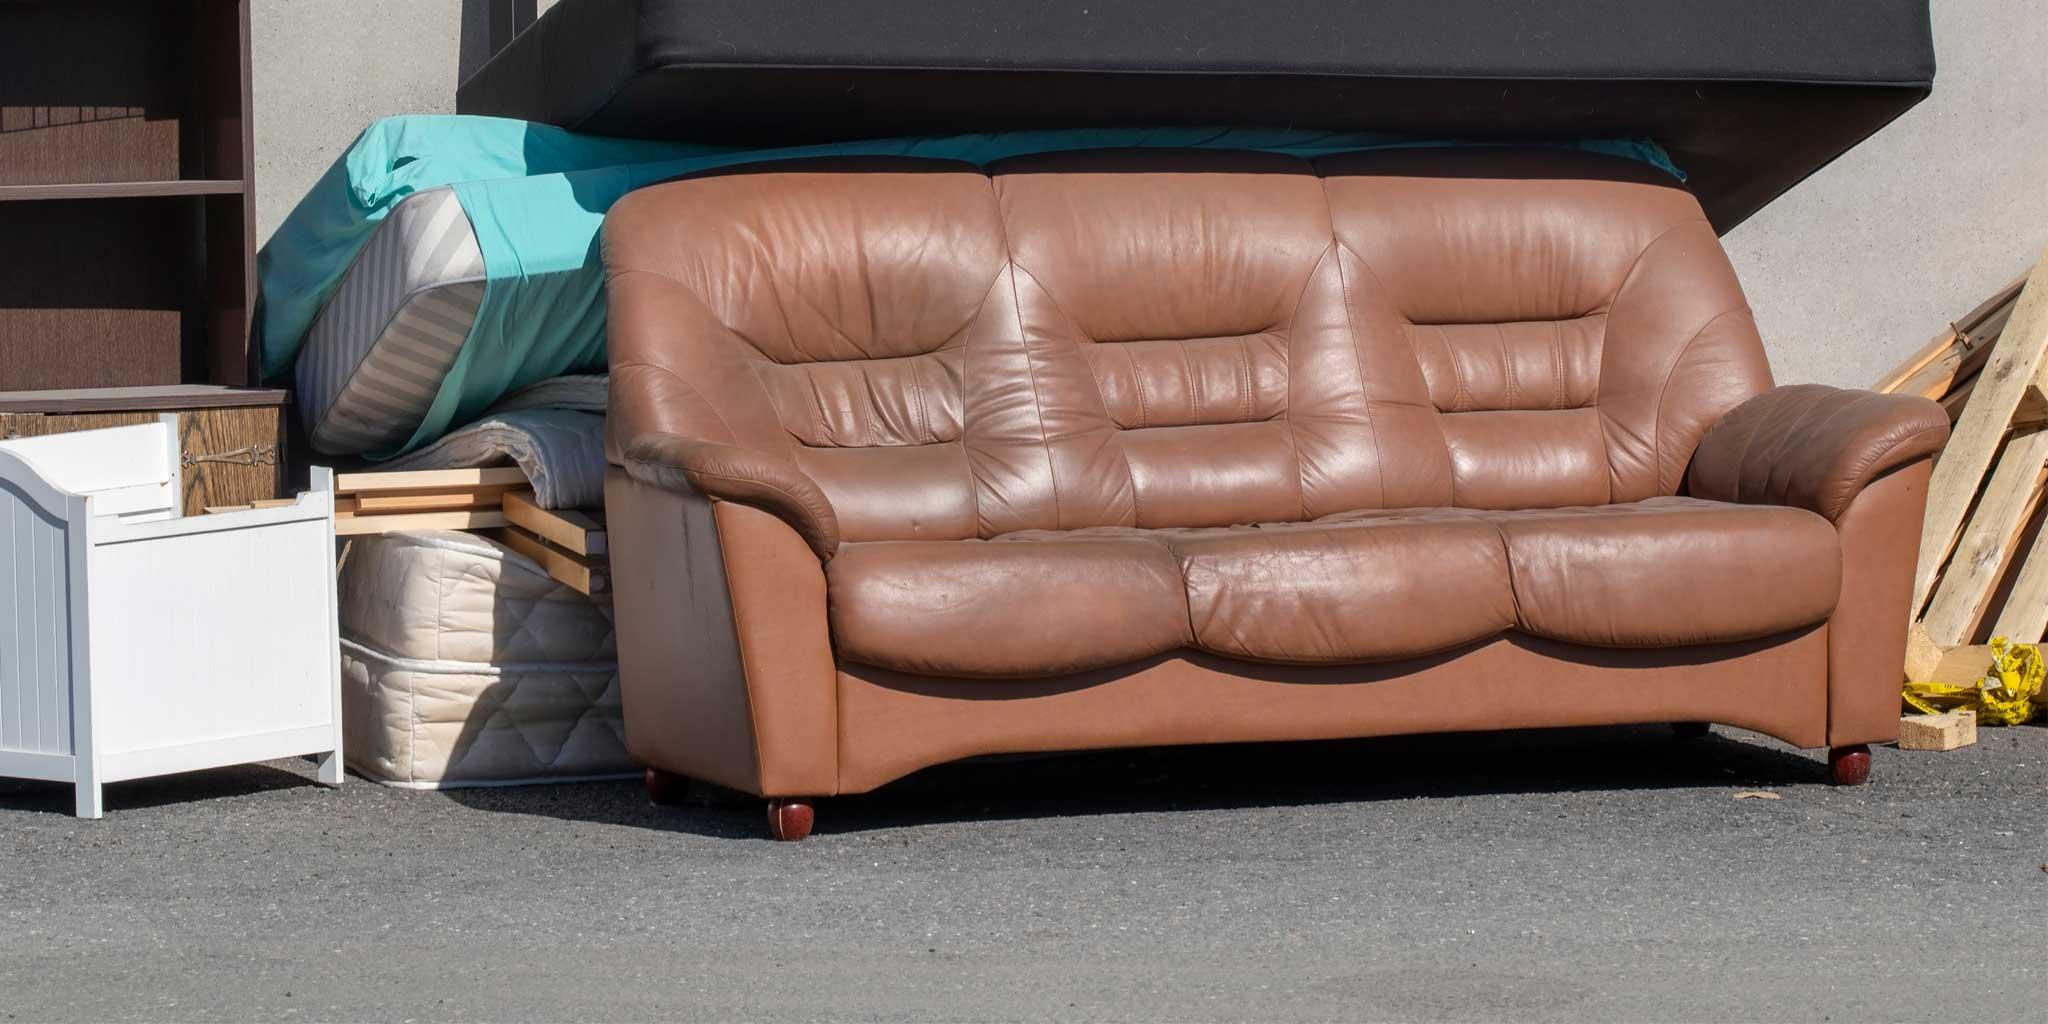 Can a sofa go into a skip